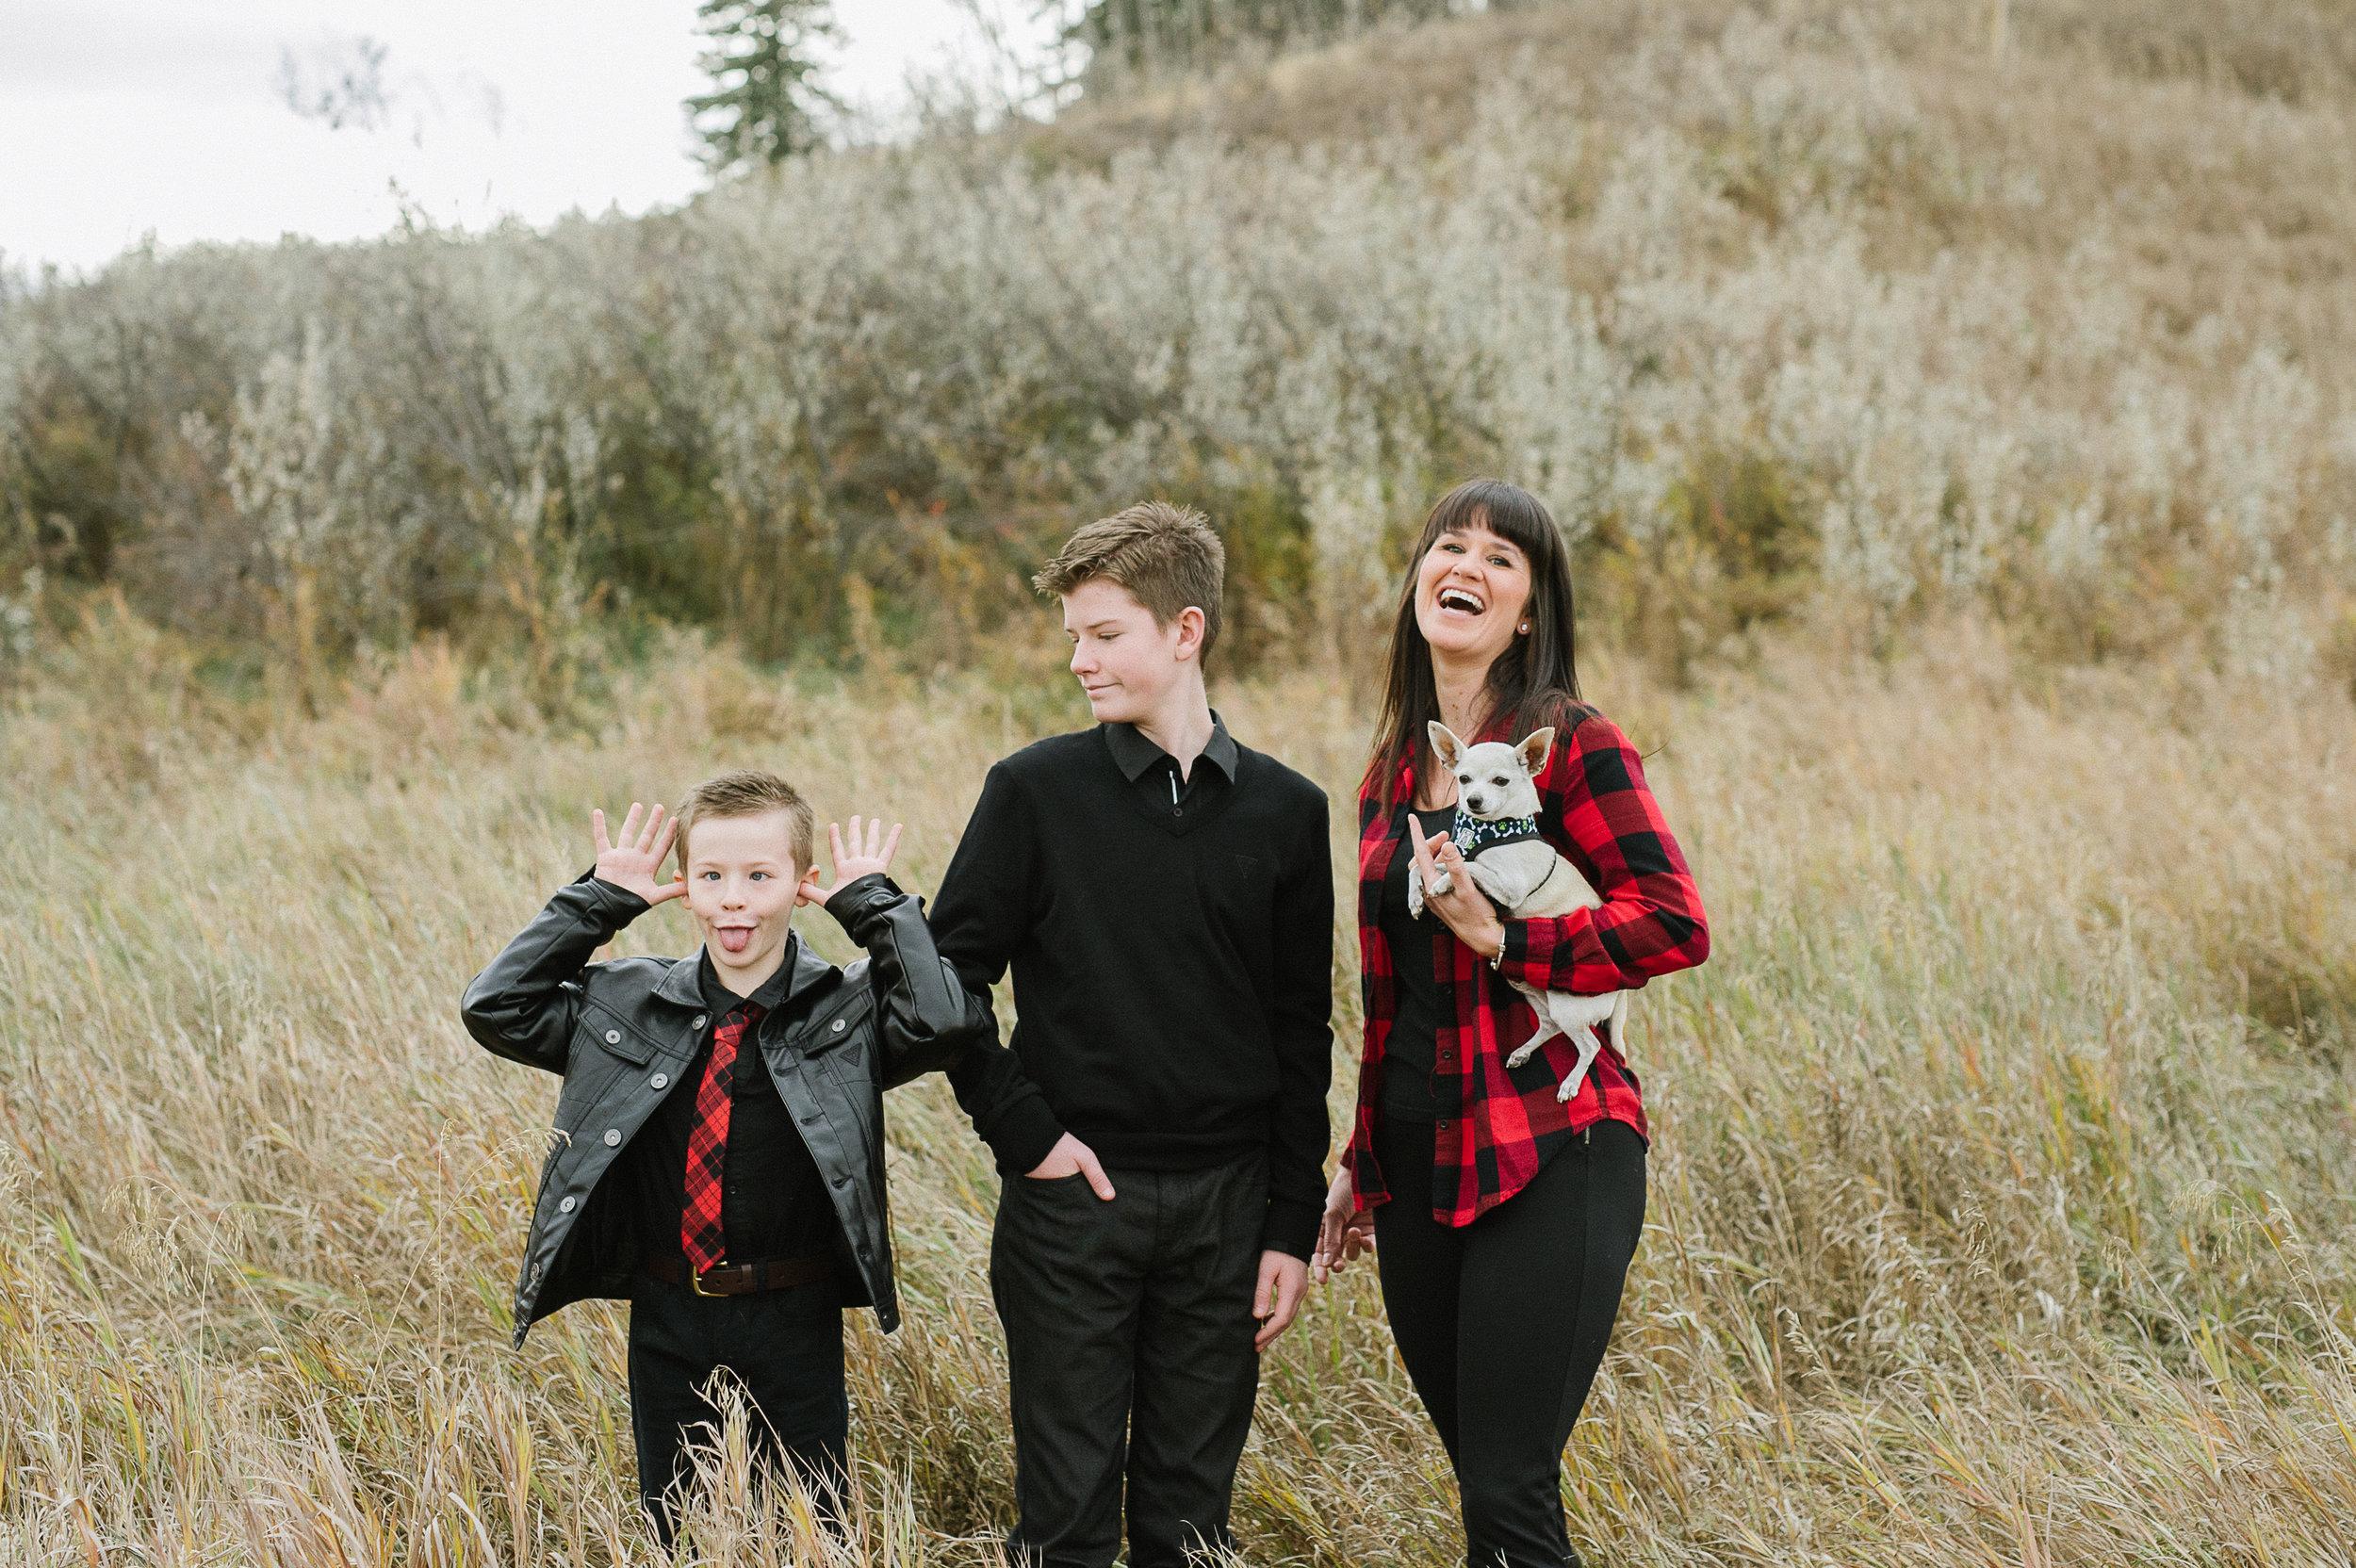 Calgary_Family_Photography_Peters_2017_HR 0003.jpg